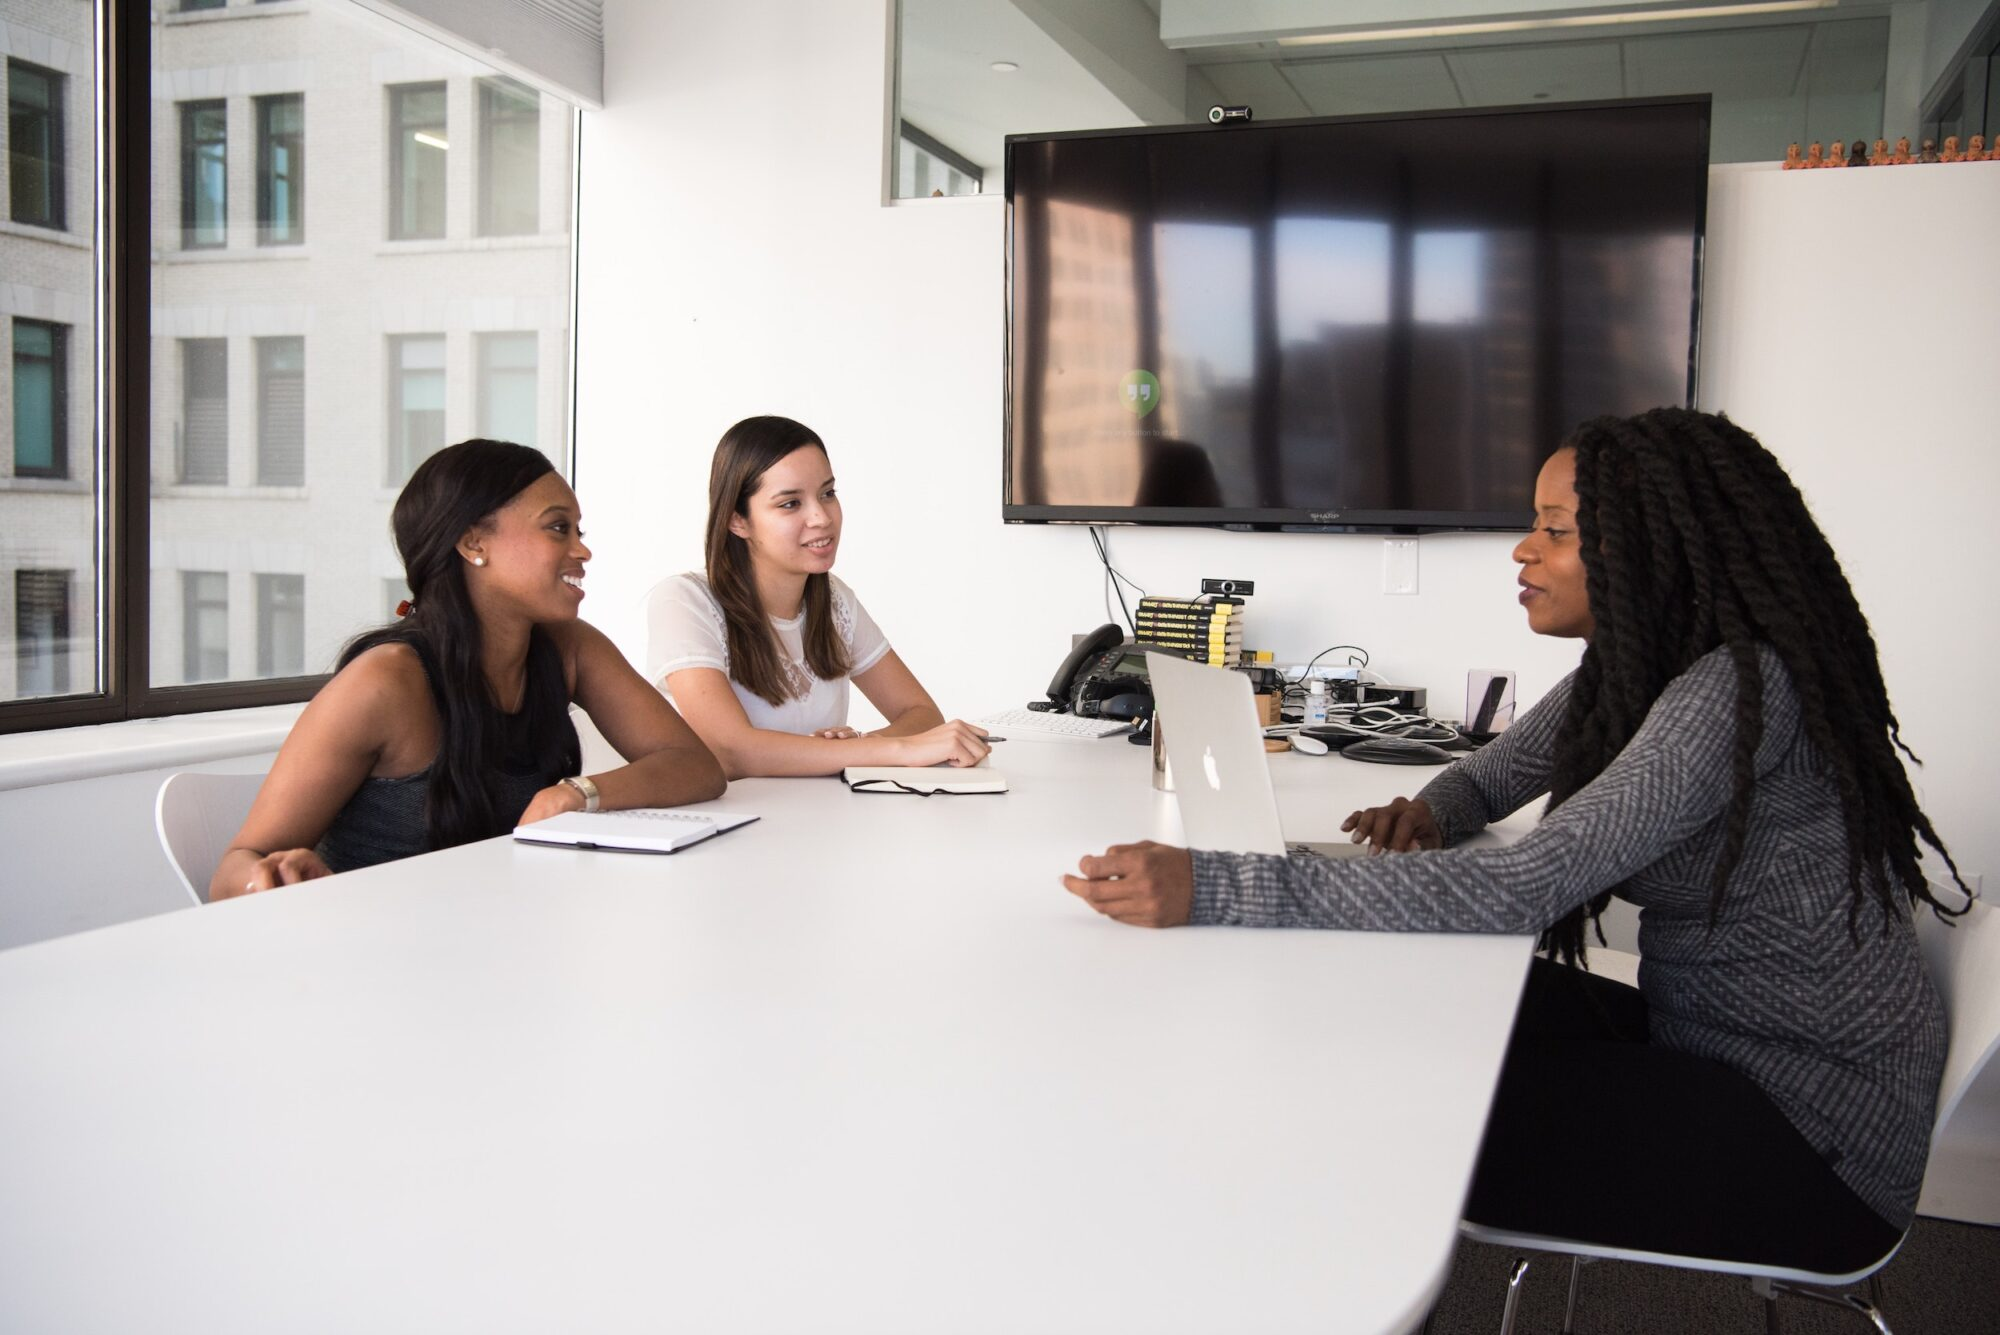 Creating More Empathetic, Human-Focused Companies